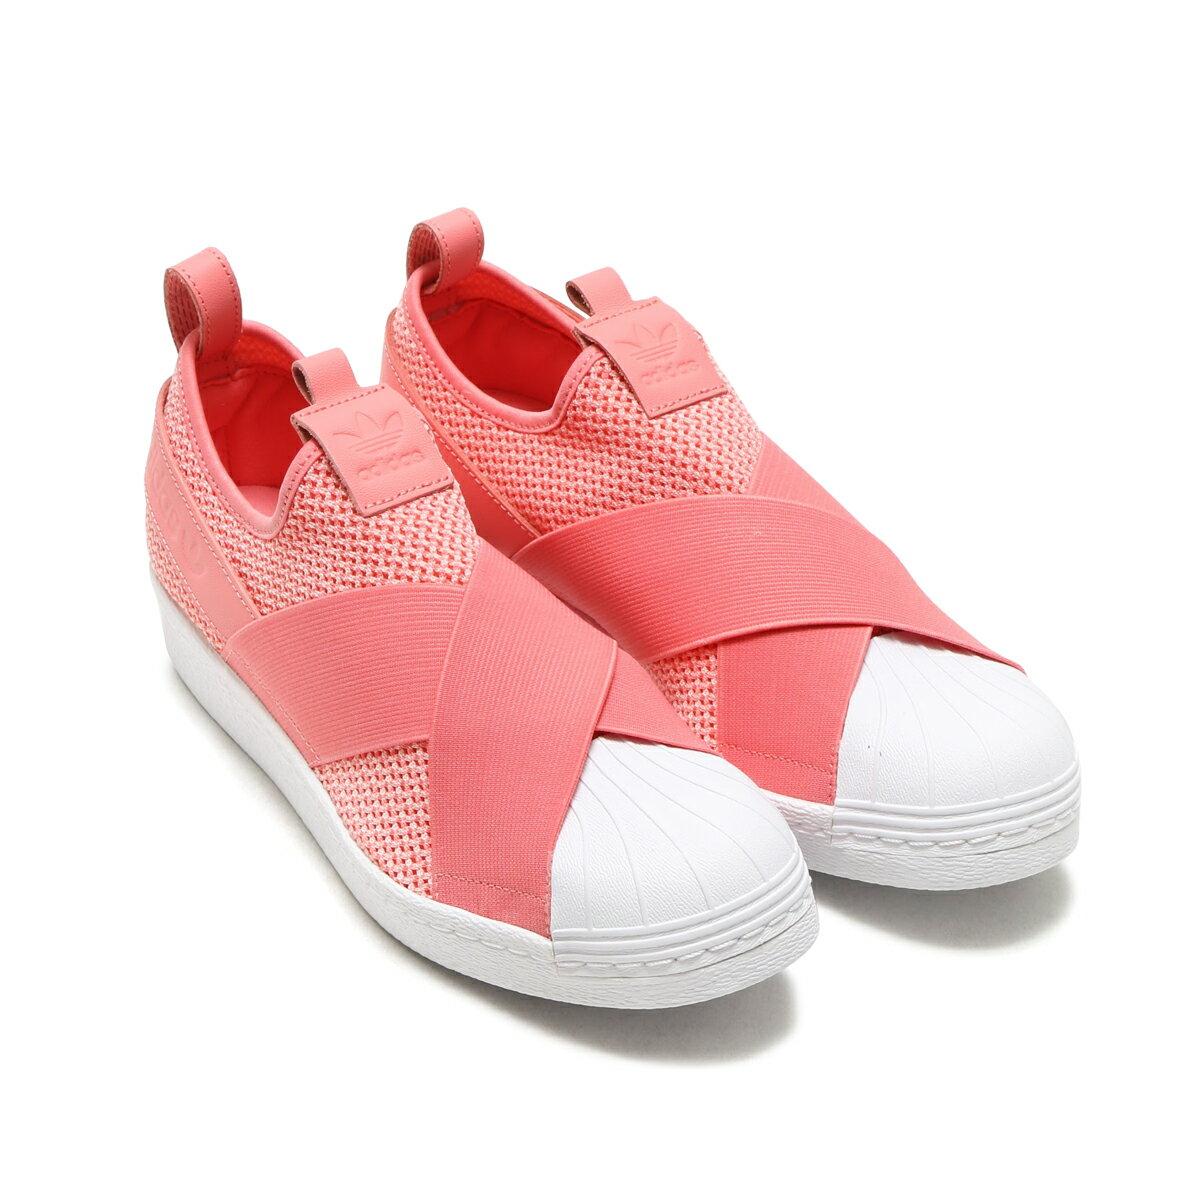 adidas Originals SUPERSTAR SlipOn W(アディダス オリジナルス スーパースター スリップオン)Tactile Rose/Tactile Rose/Running White【レディース スリッポン】17FW-I